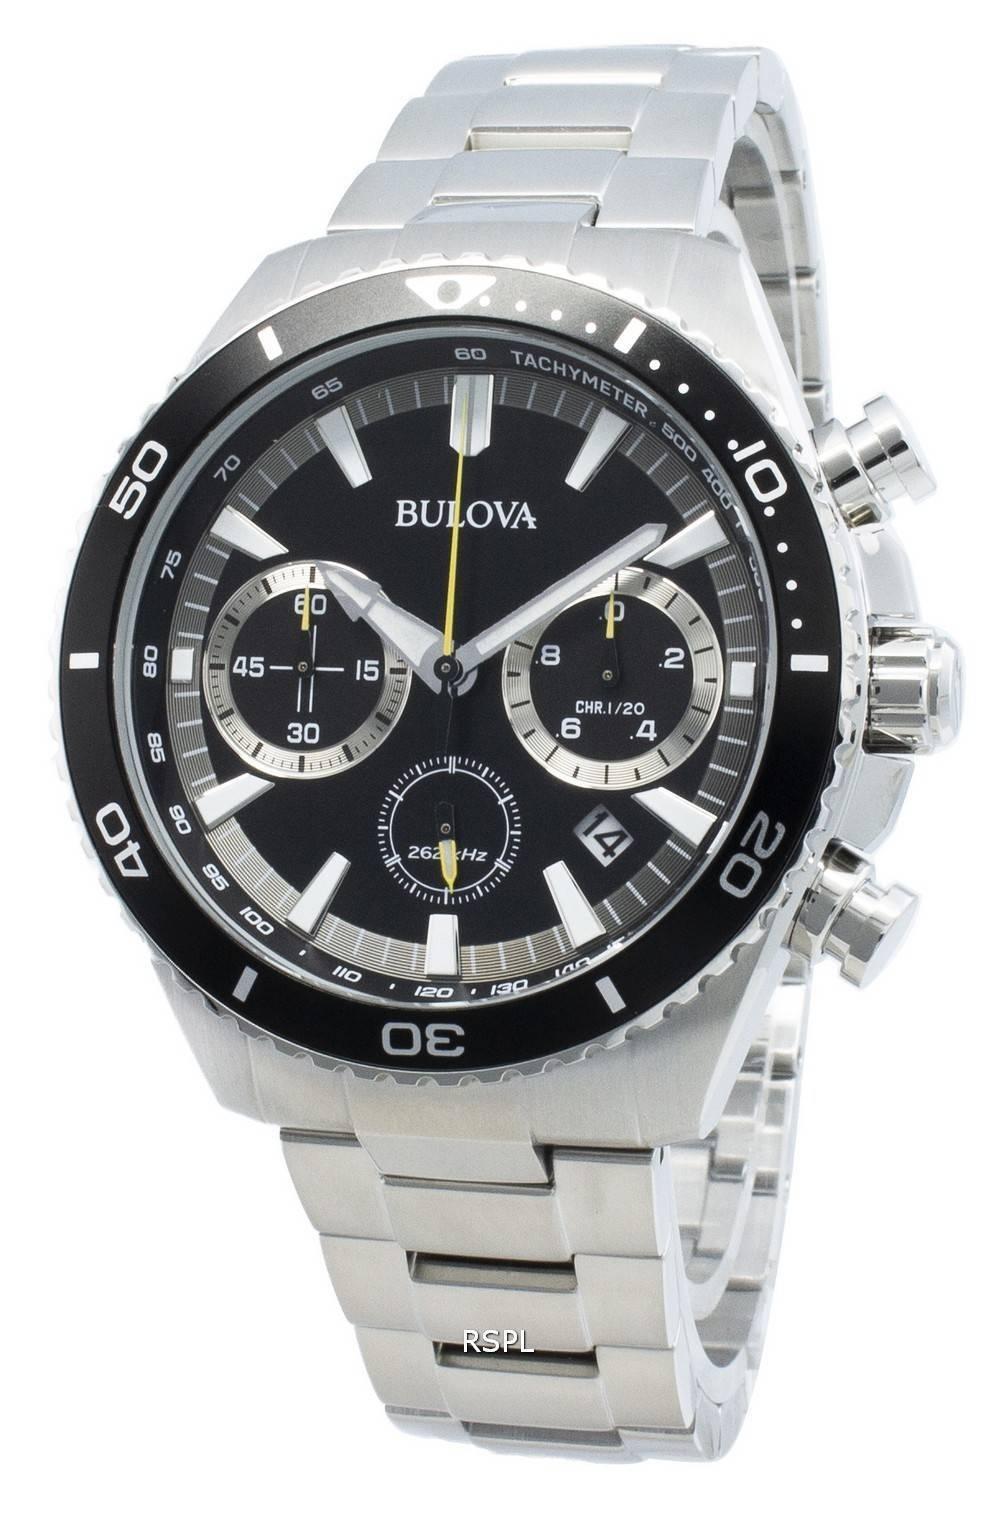 Bulova 98B298 Chronograph Quartz Men's Watch